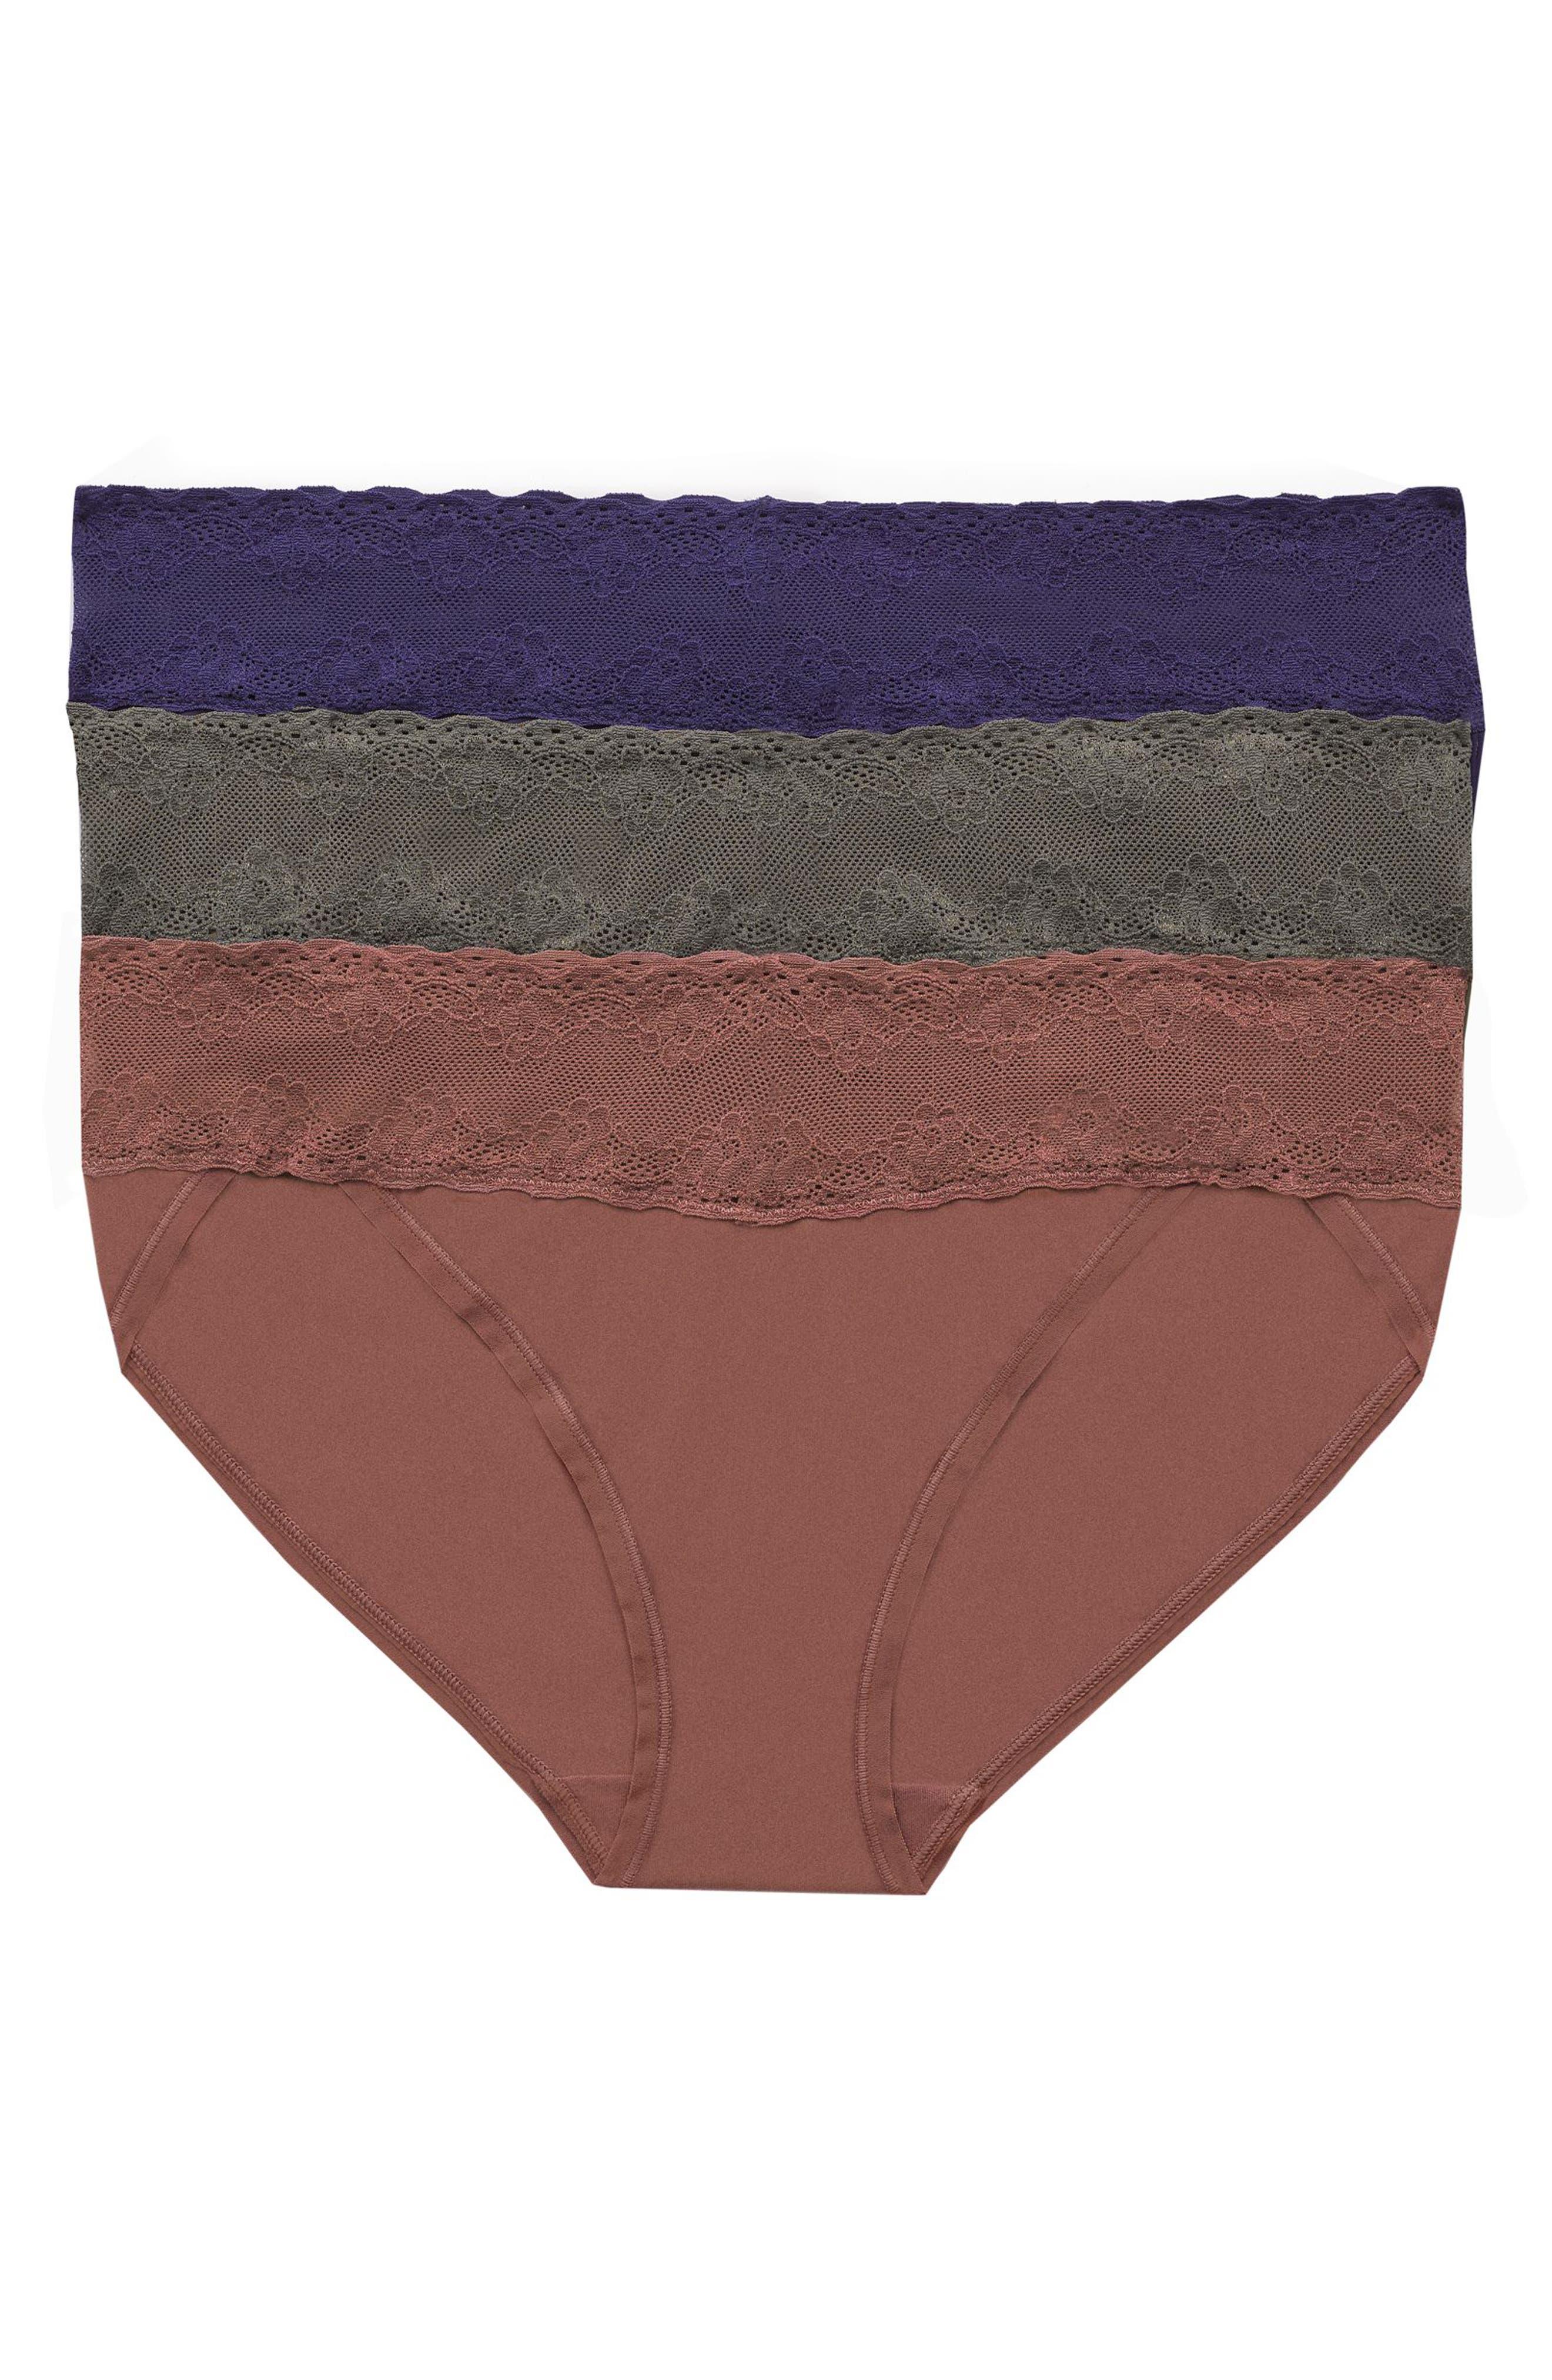 'Bliss Perfection' Bikini Briefs,                             Main thumbnail 1, color,                             Dark Iris/ Olive/ Red Clay